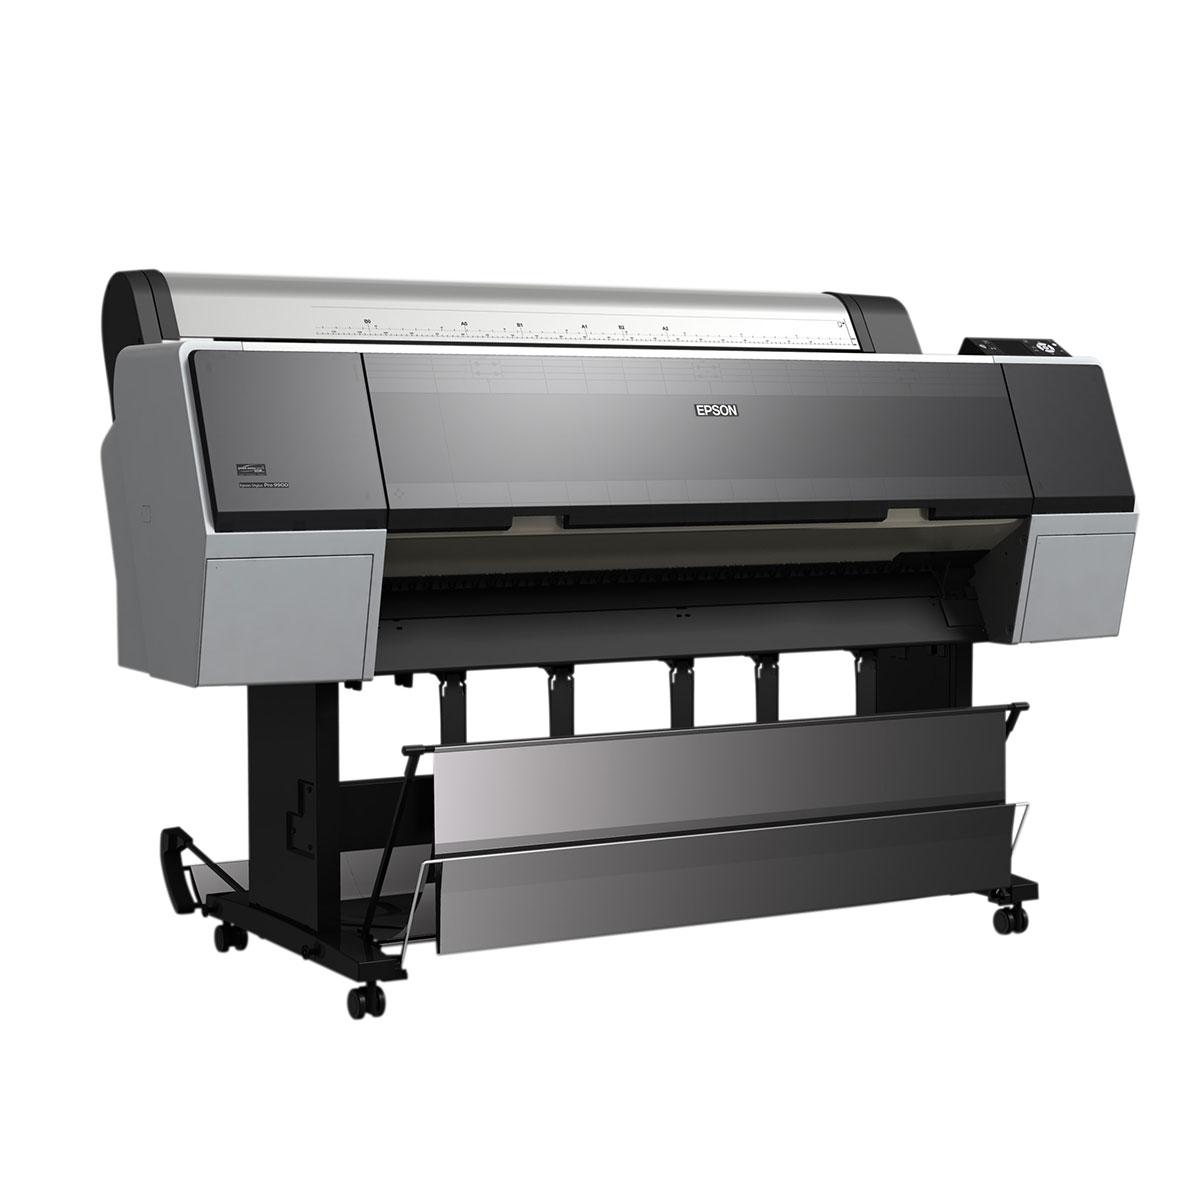 plottaggi digitali, stampa plotter, torino, stampa su carta fotografica, foto